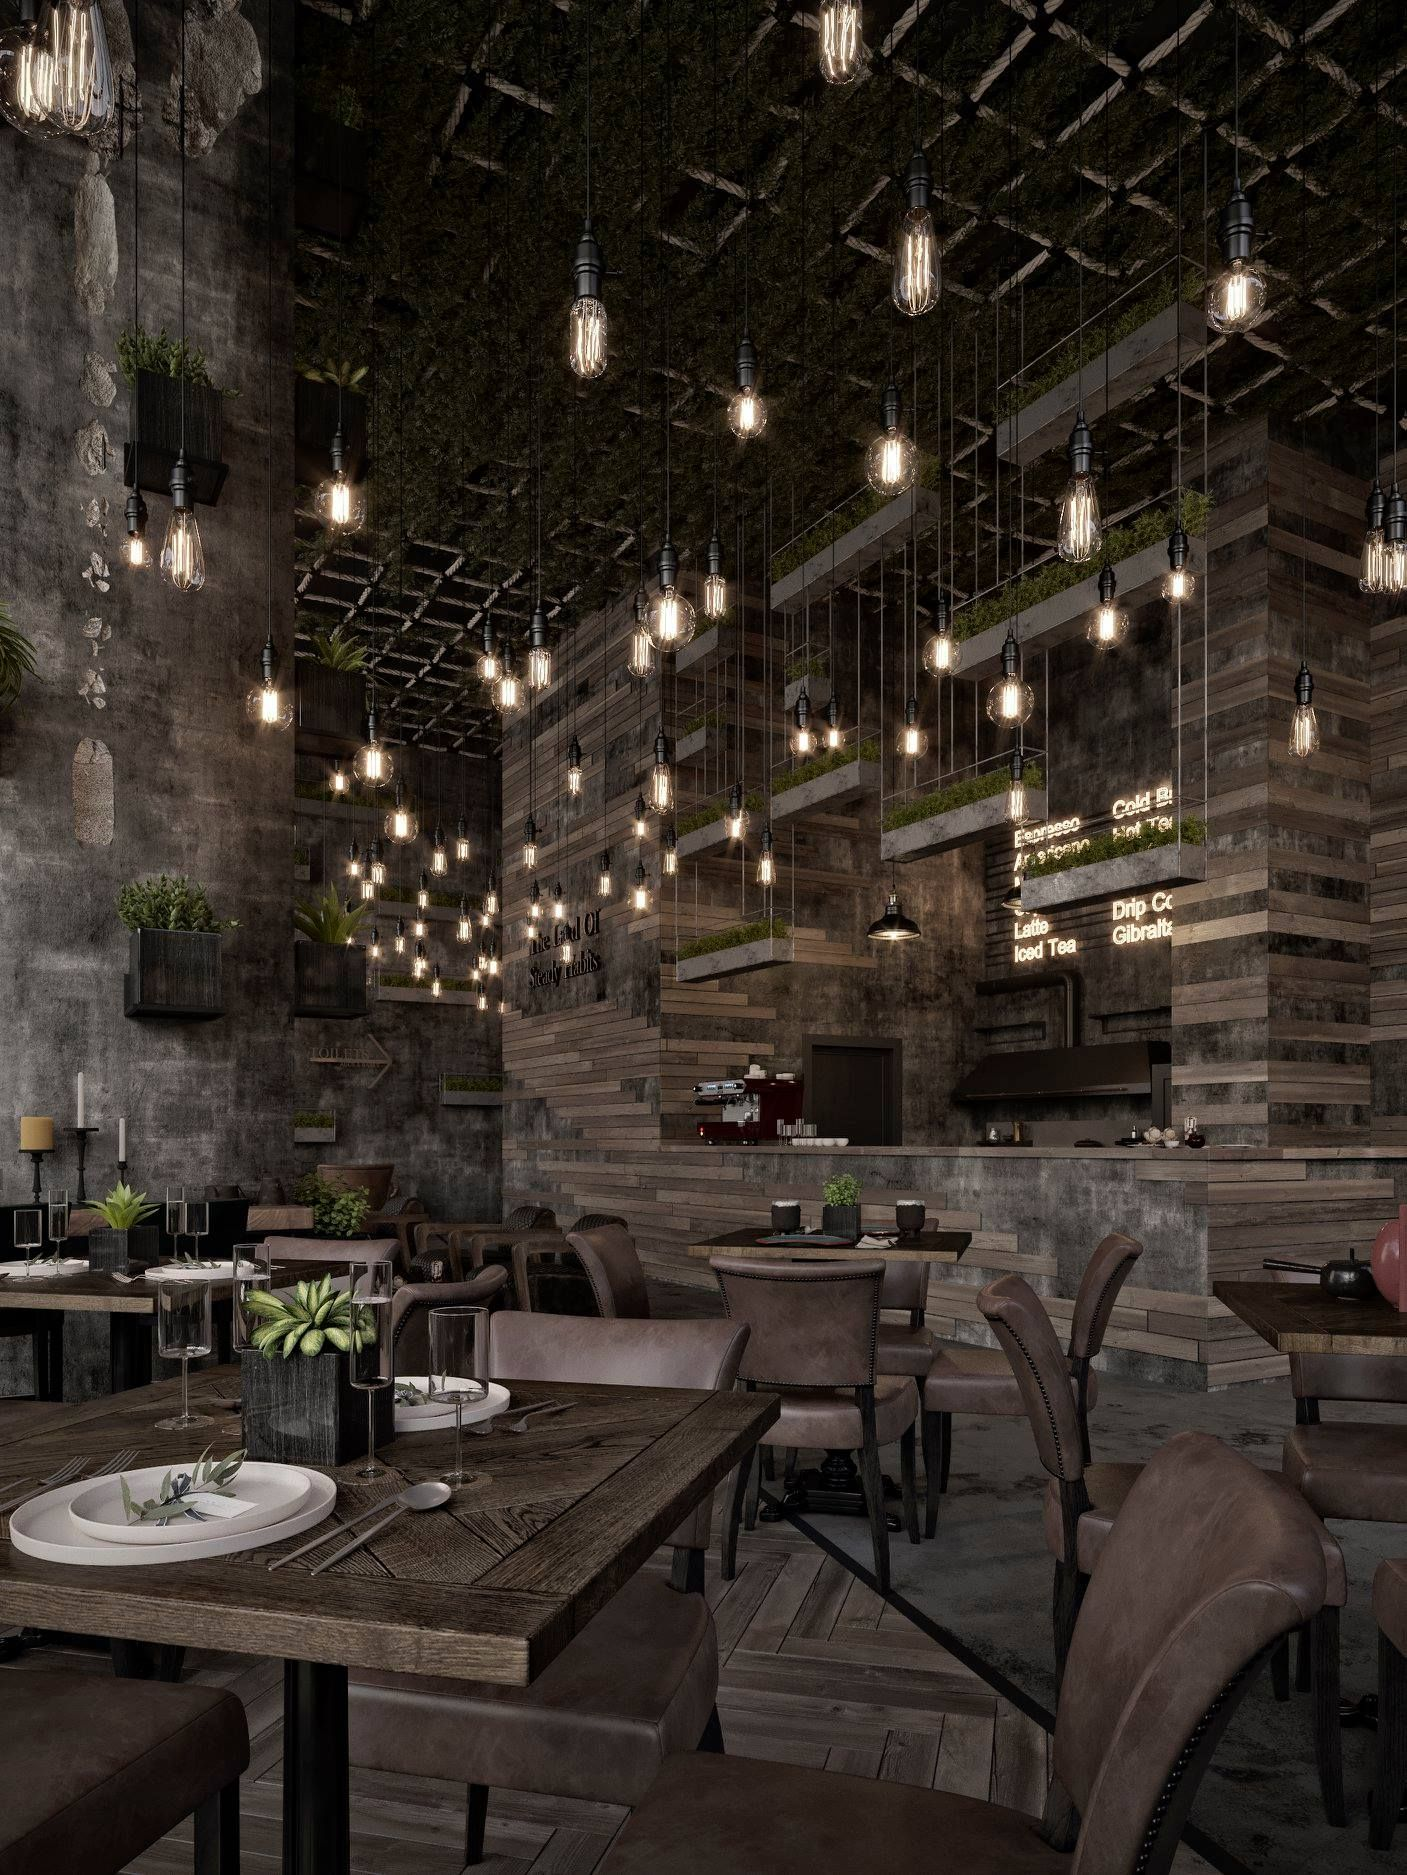 Qatar Calm Street Cafe In 2020 Restaurant Lighting Design Modern Restaurant Design Cafe Interior Design